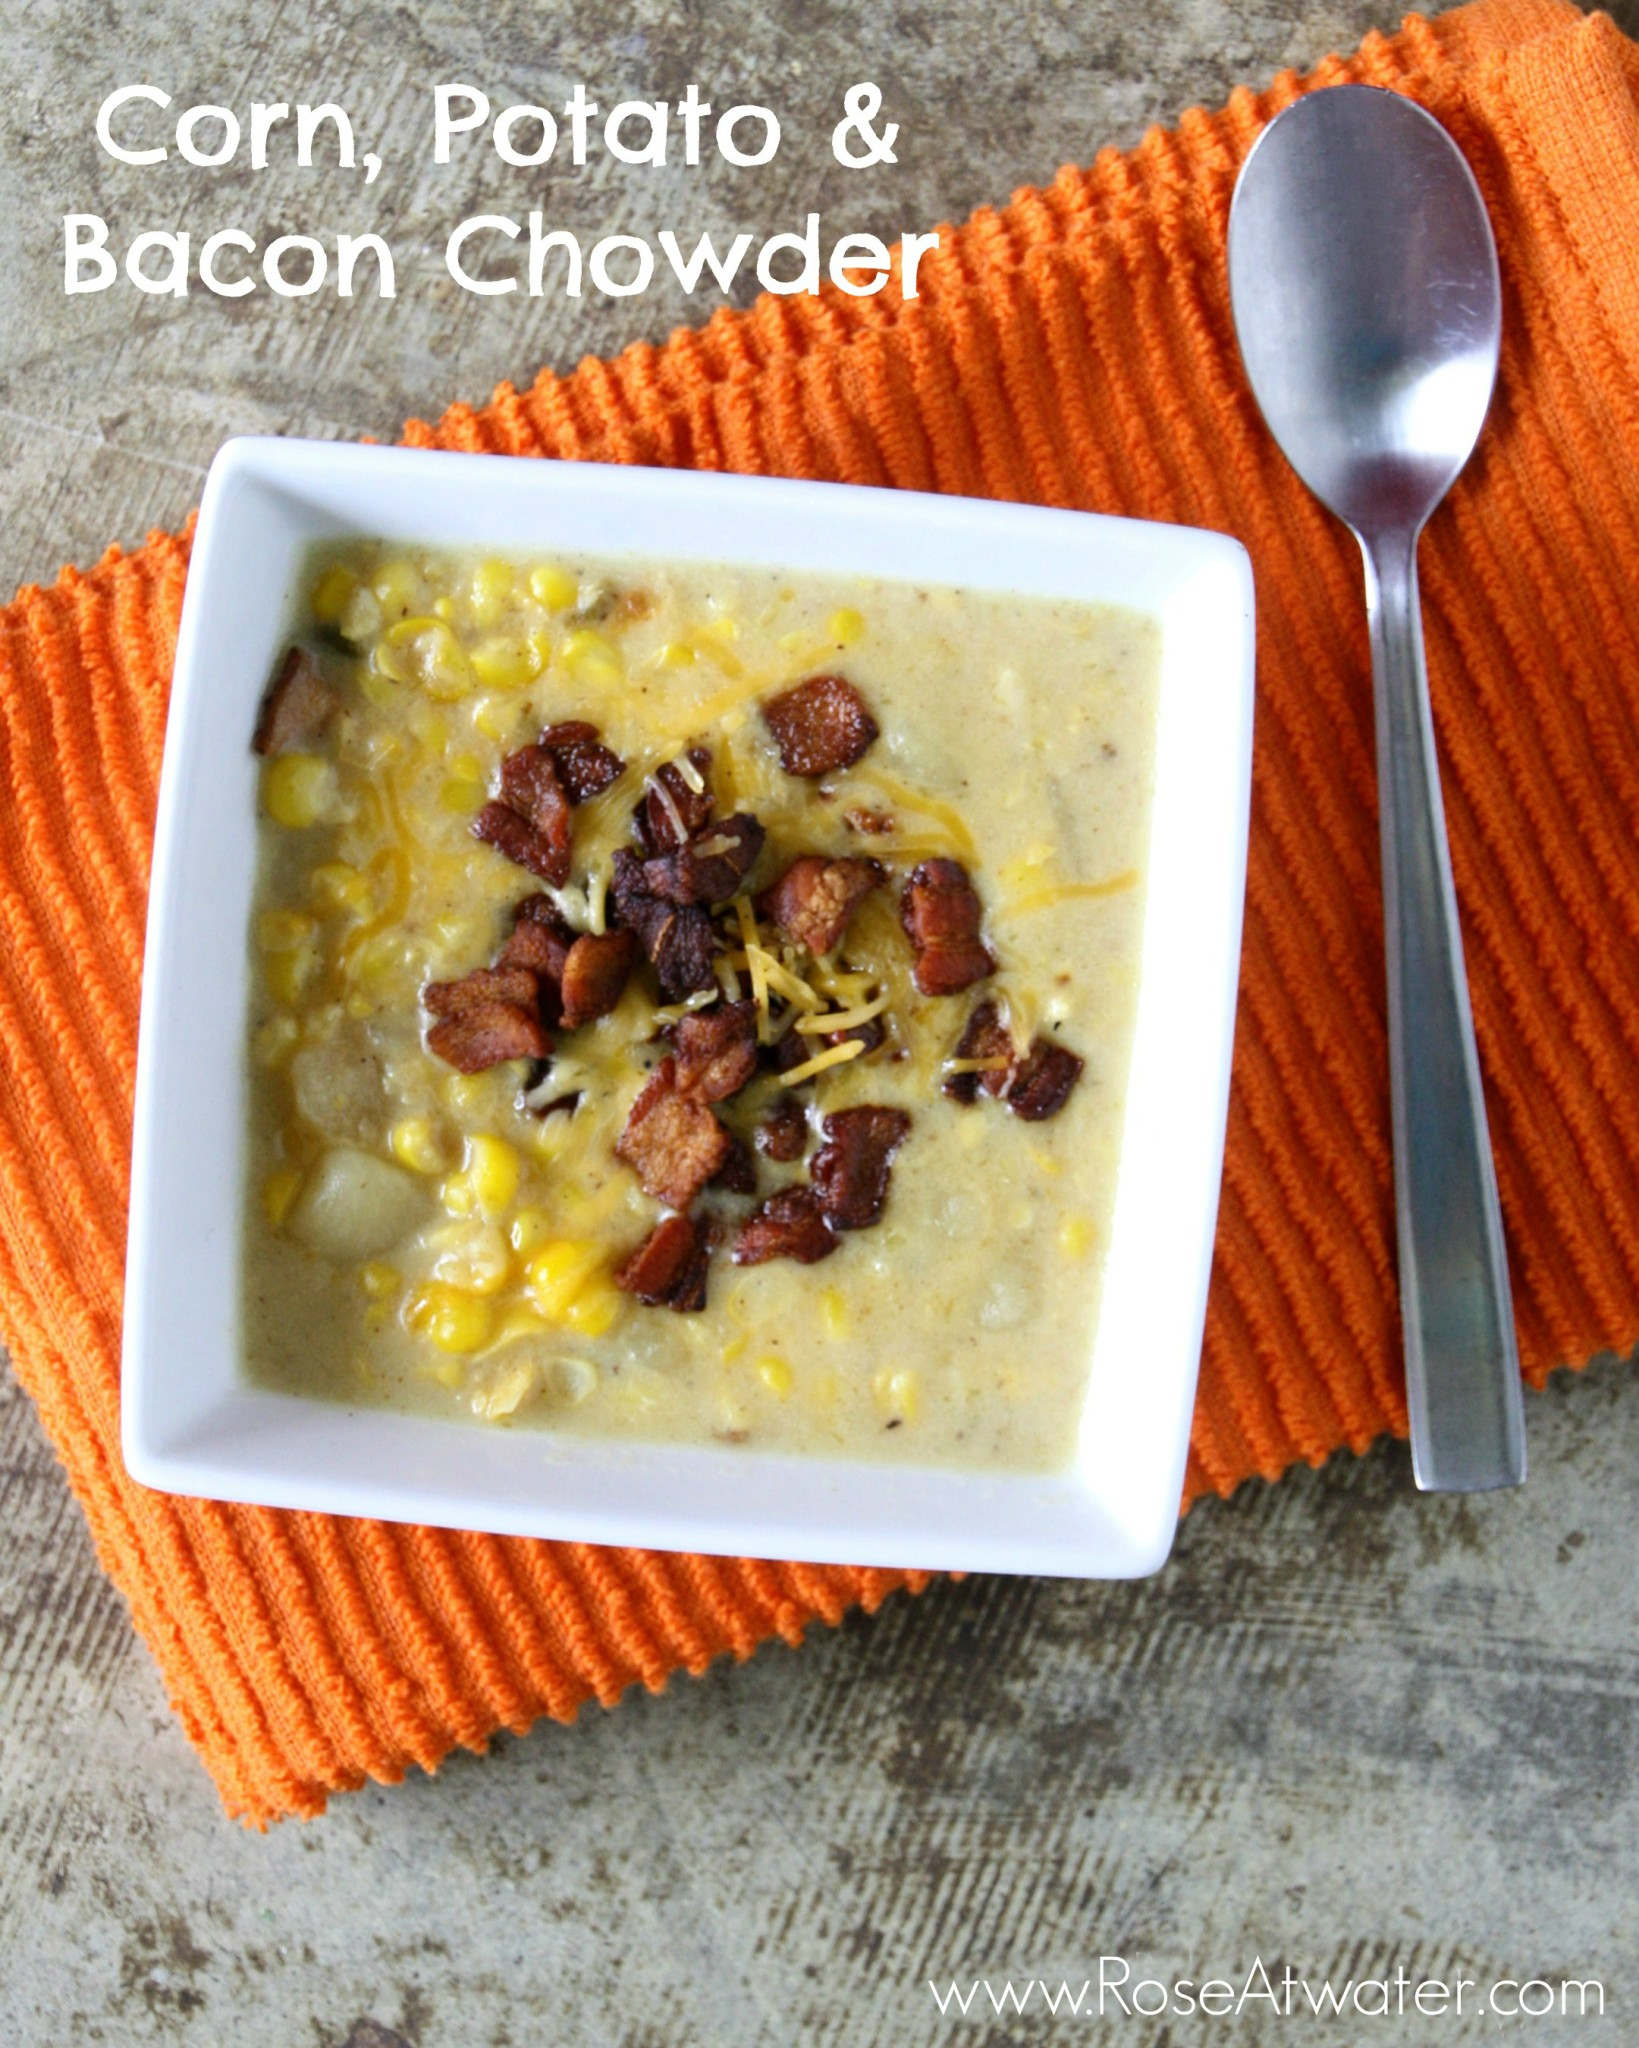 Corn, Potato & Bacon Chowder